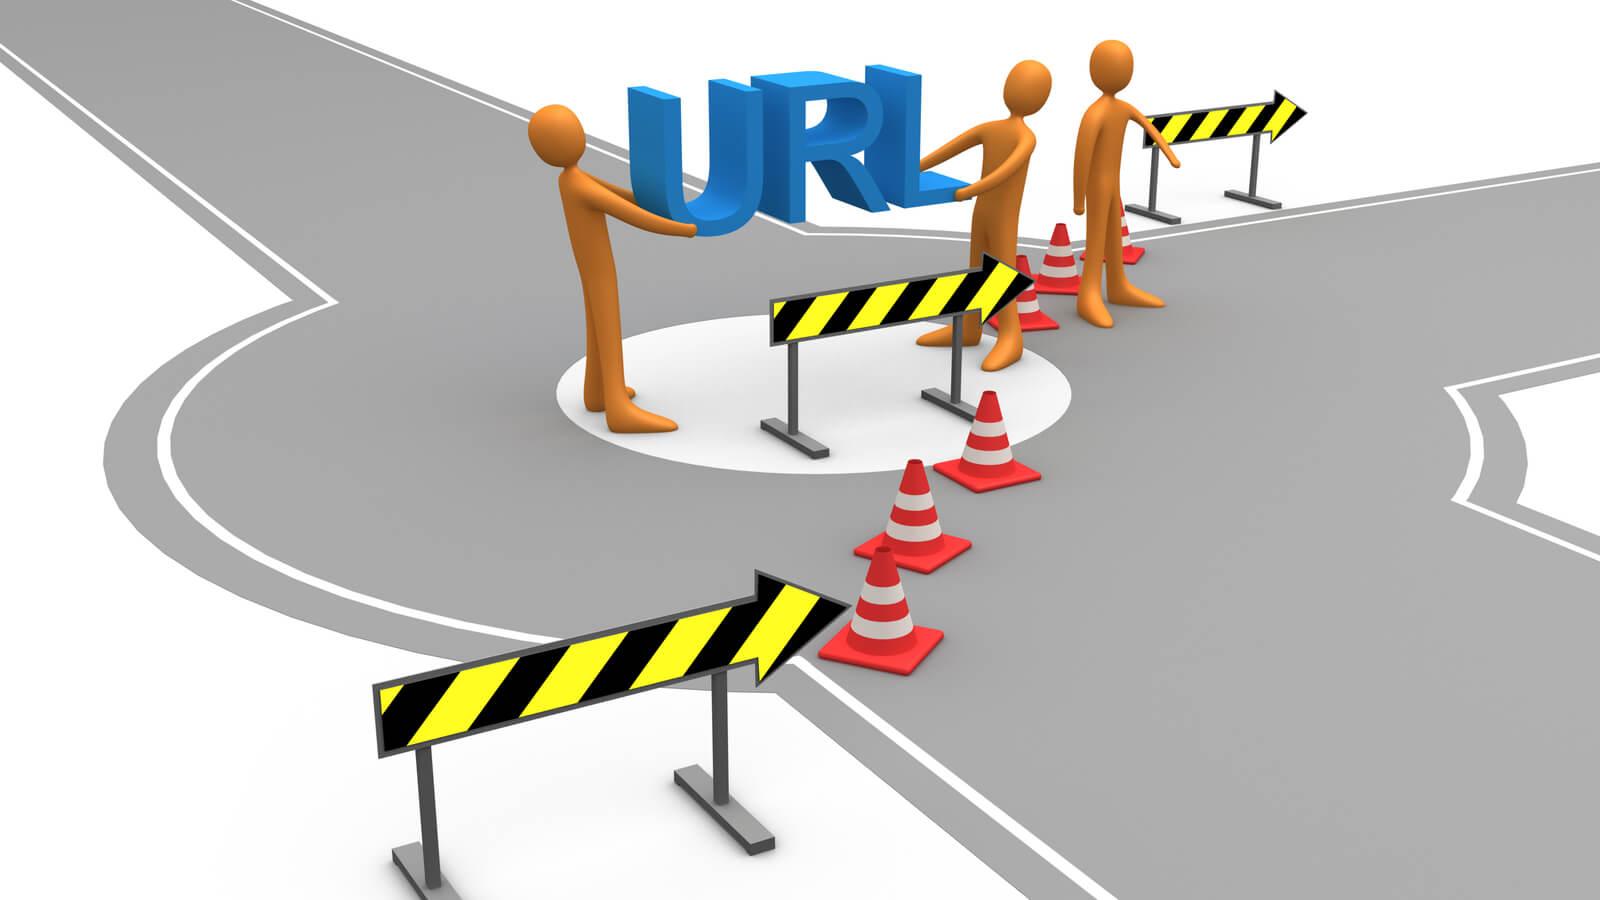 Minimize redirects